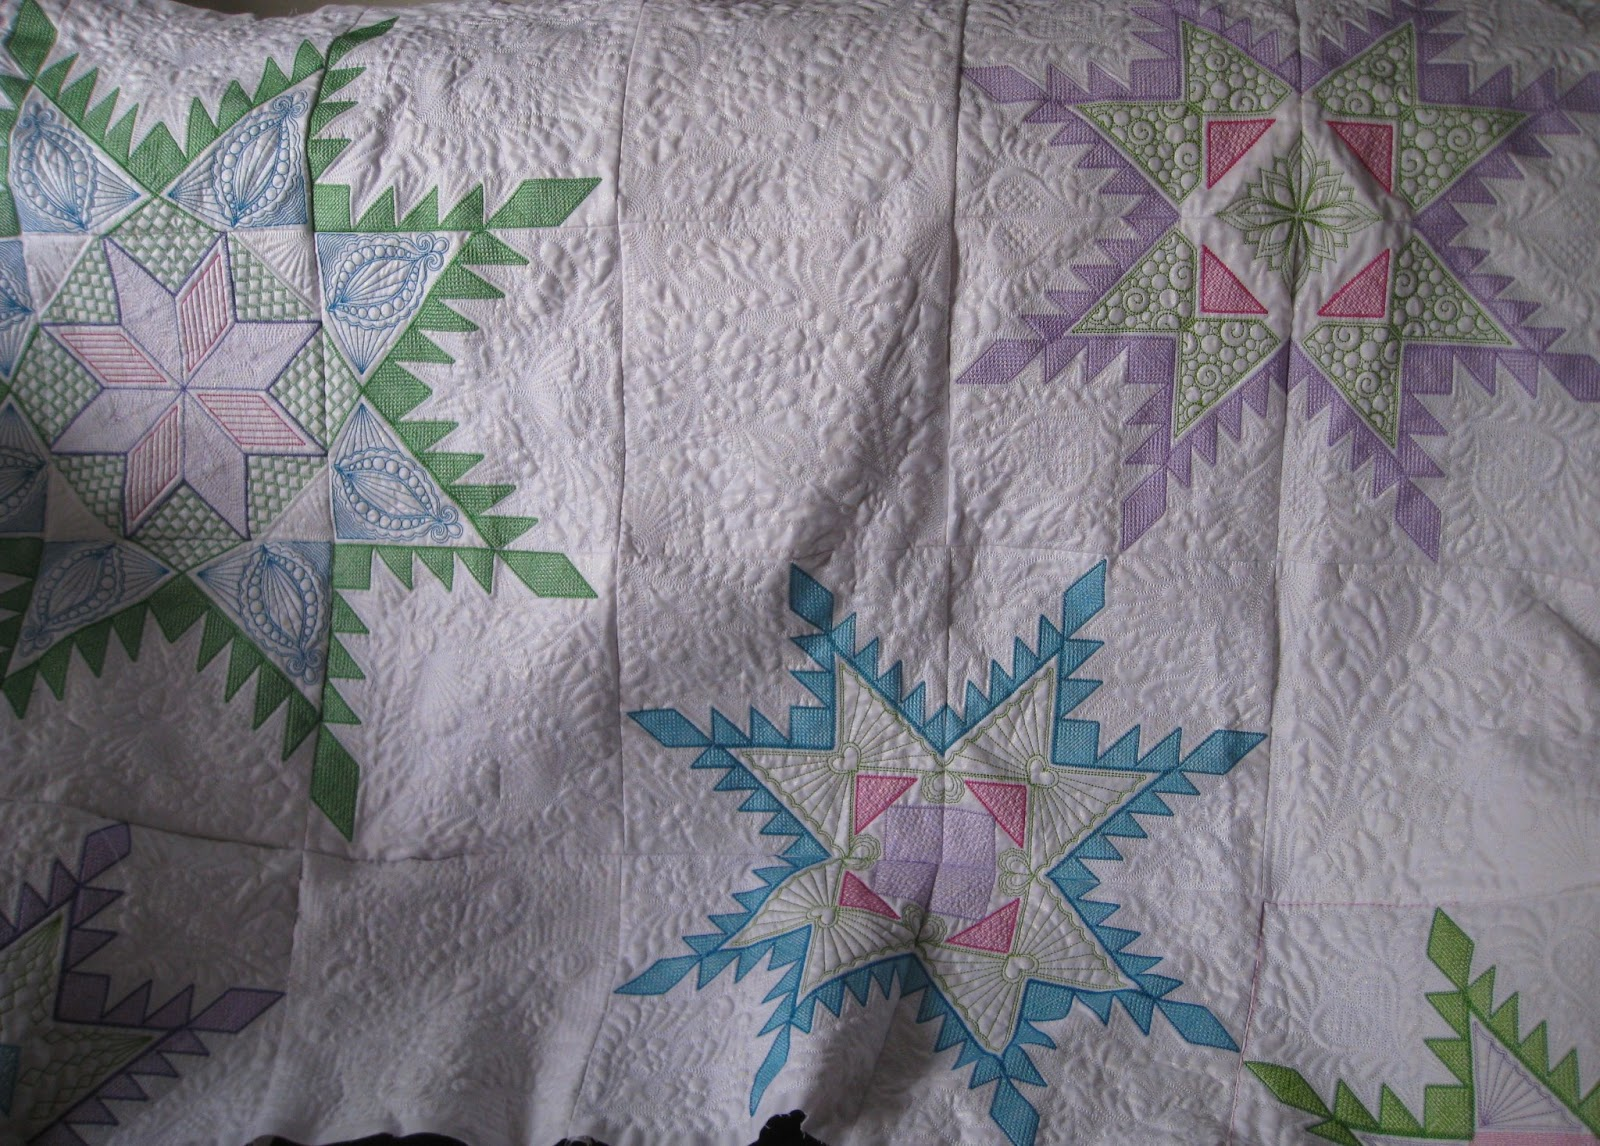 Vicki S Fabric Creations Crazy Quilt Block 26